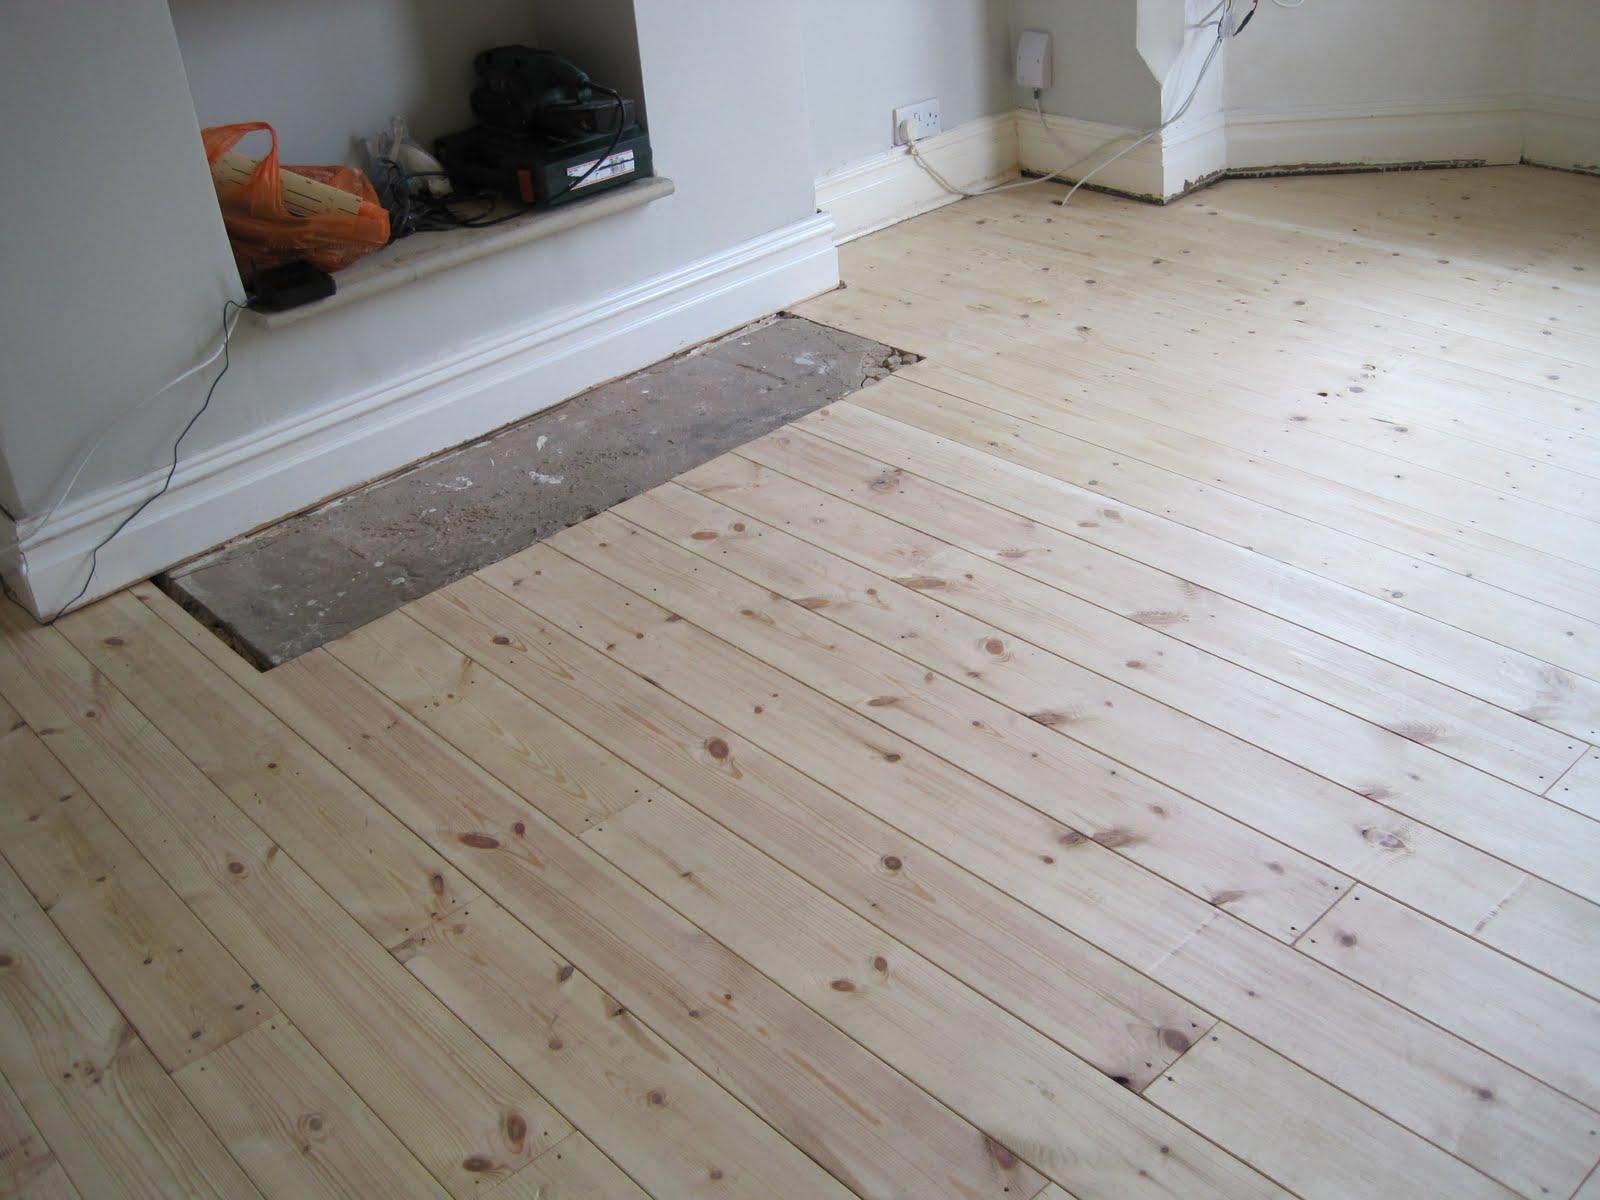 Living room la vida loca part dos replacing refinishing for New floor